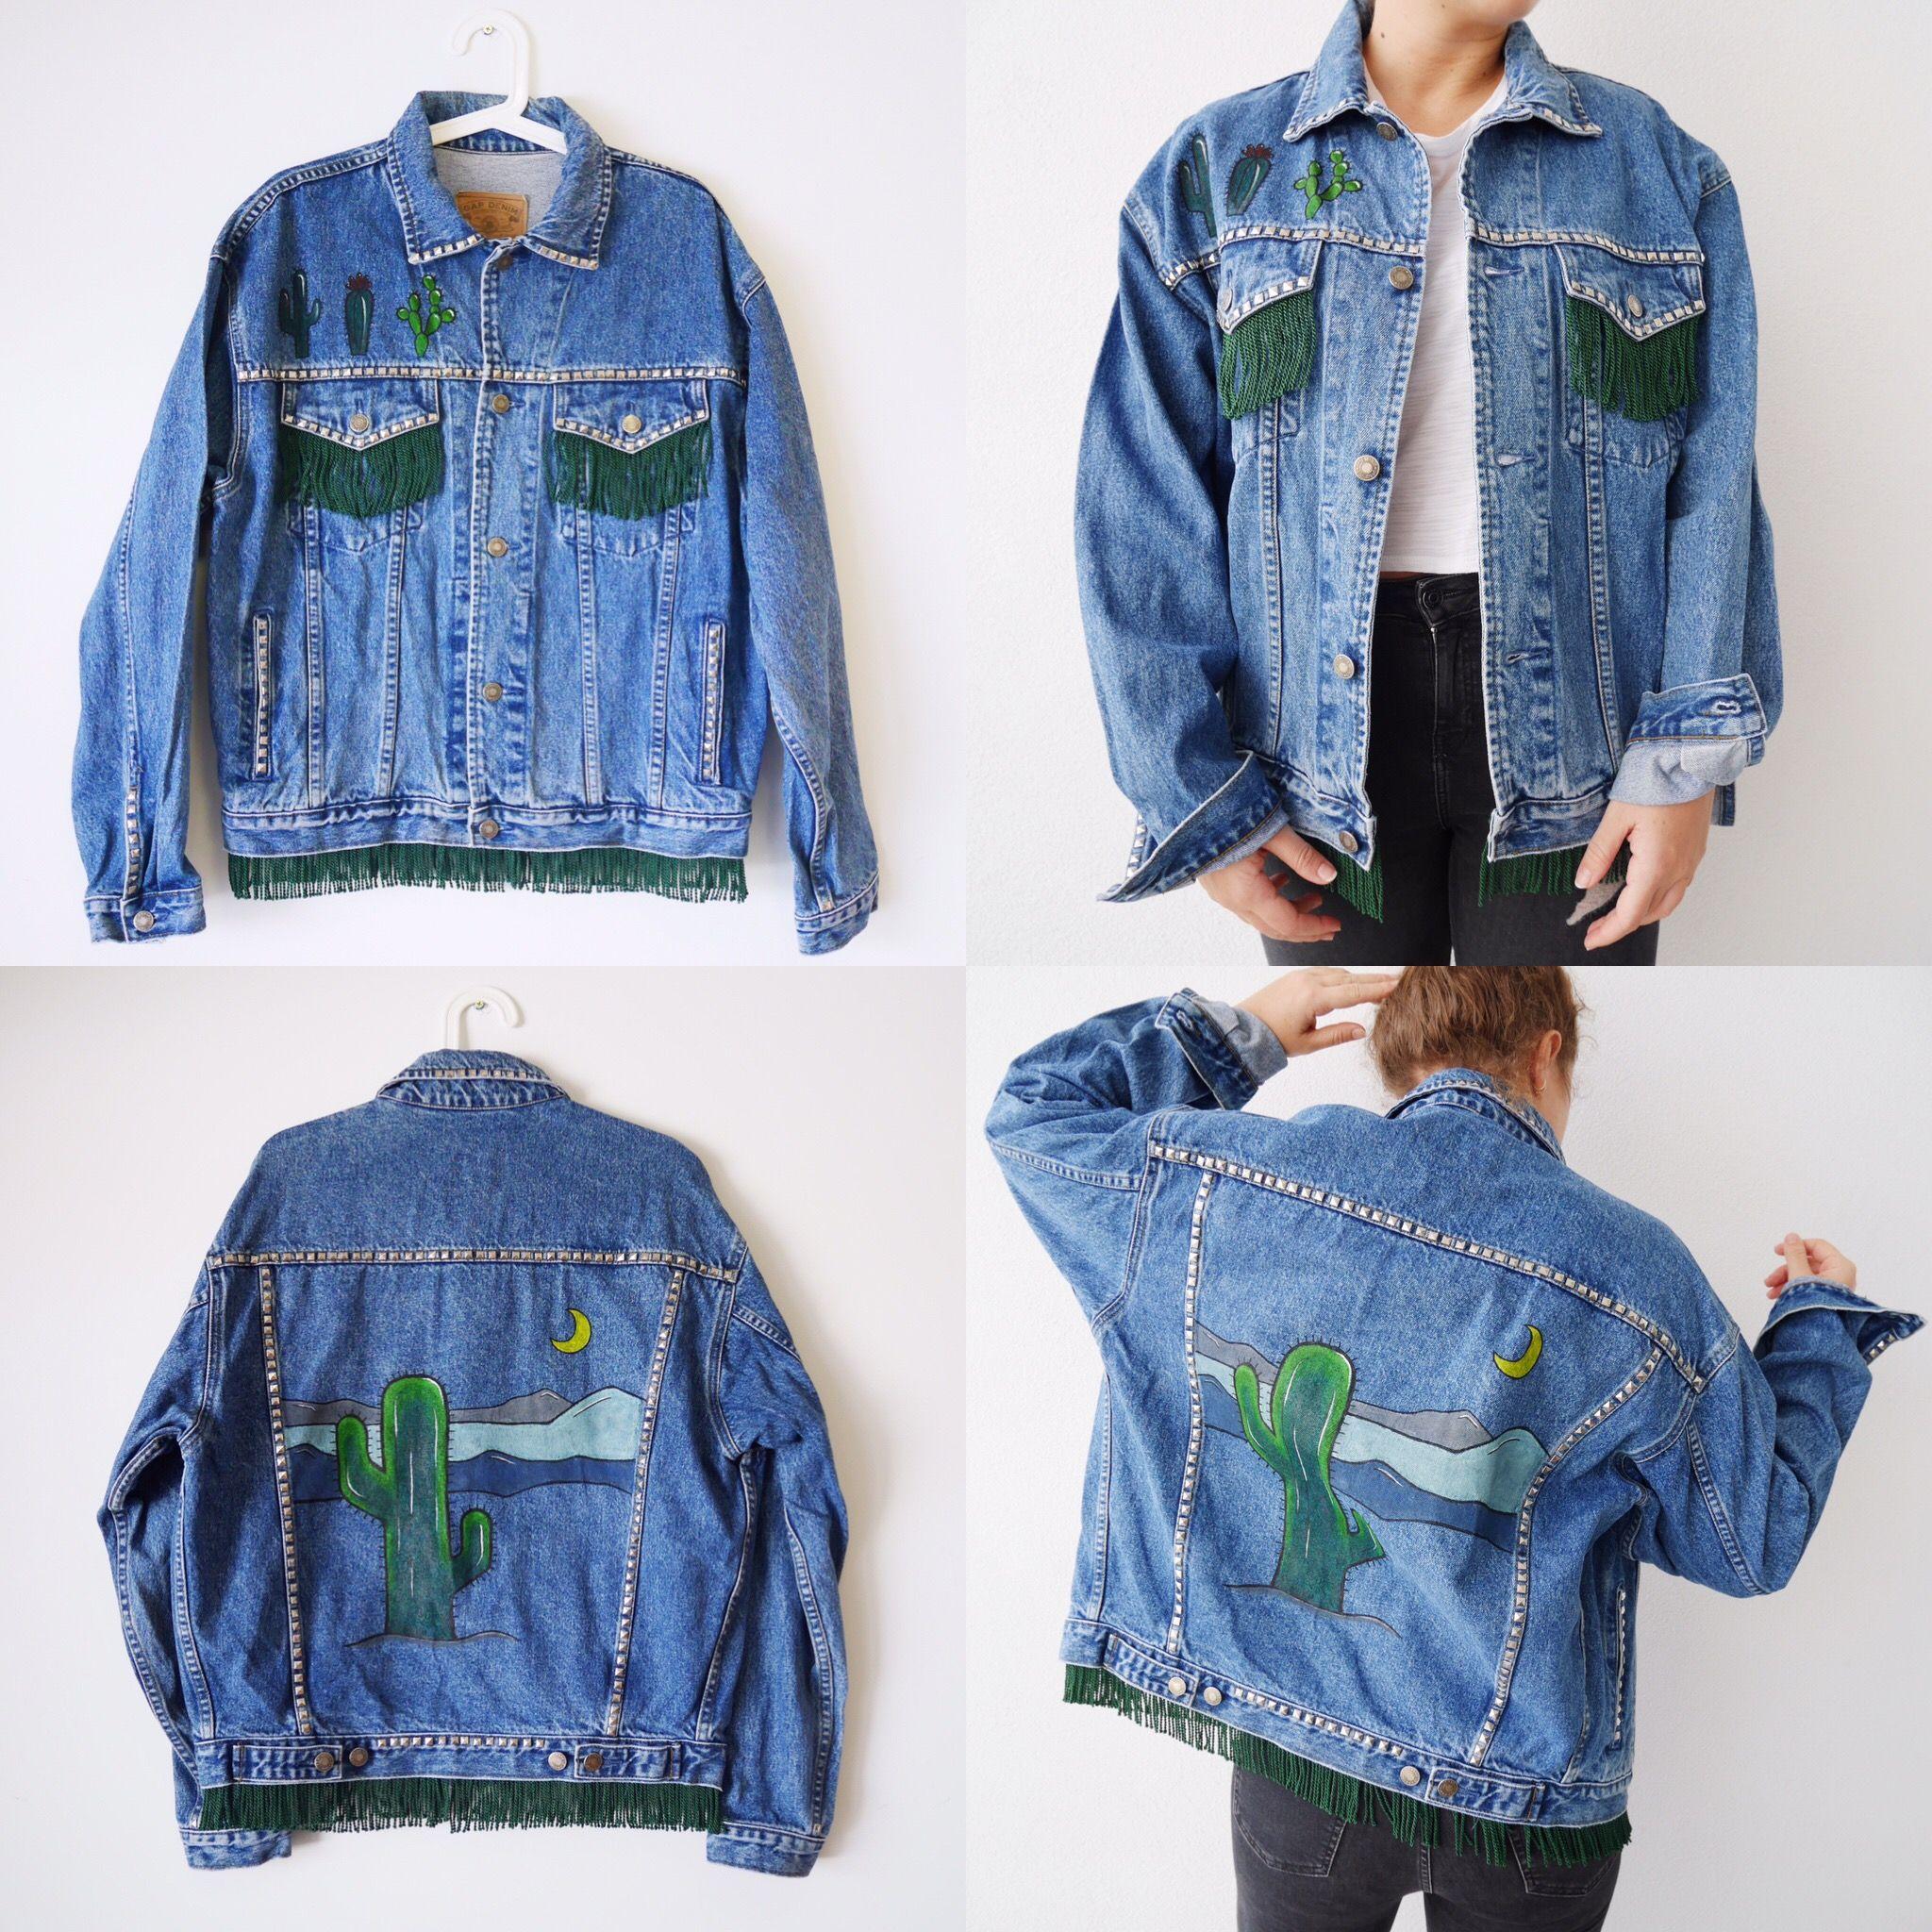 Hand Painted Oversized Vintage Denim Jacket On Etsy Cactus In Desert With Studs And Fringe Jean Jacket Outfits Painted Denim Jacket Diy Denim Jacket